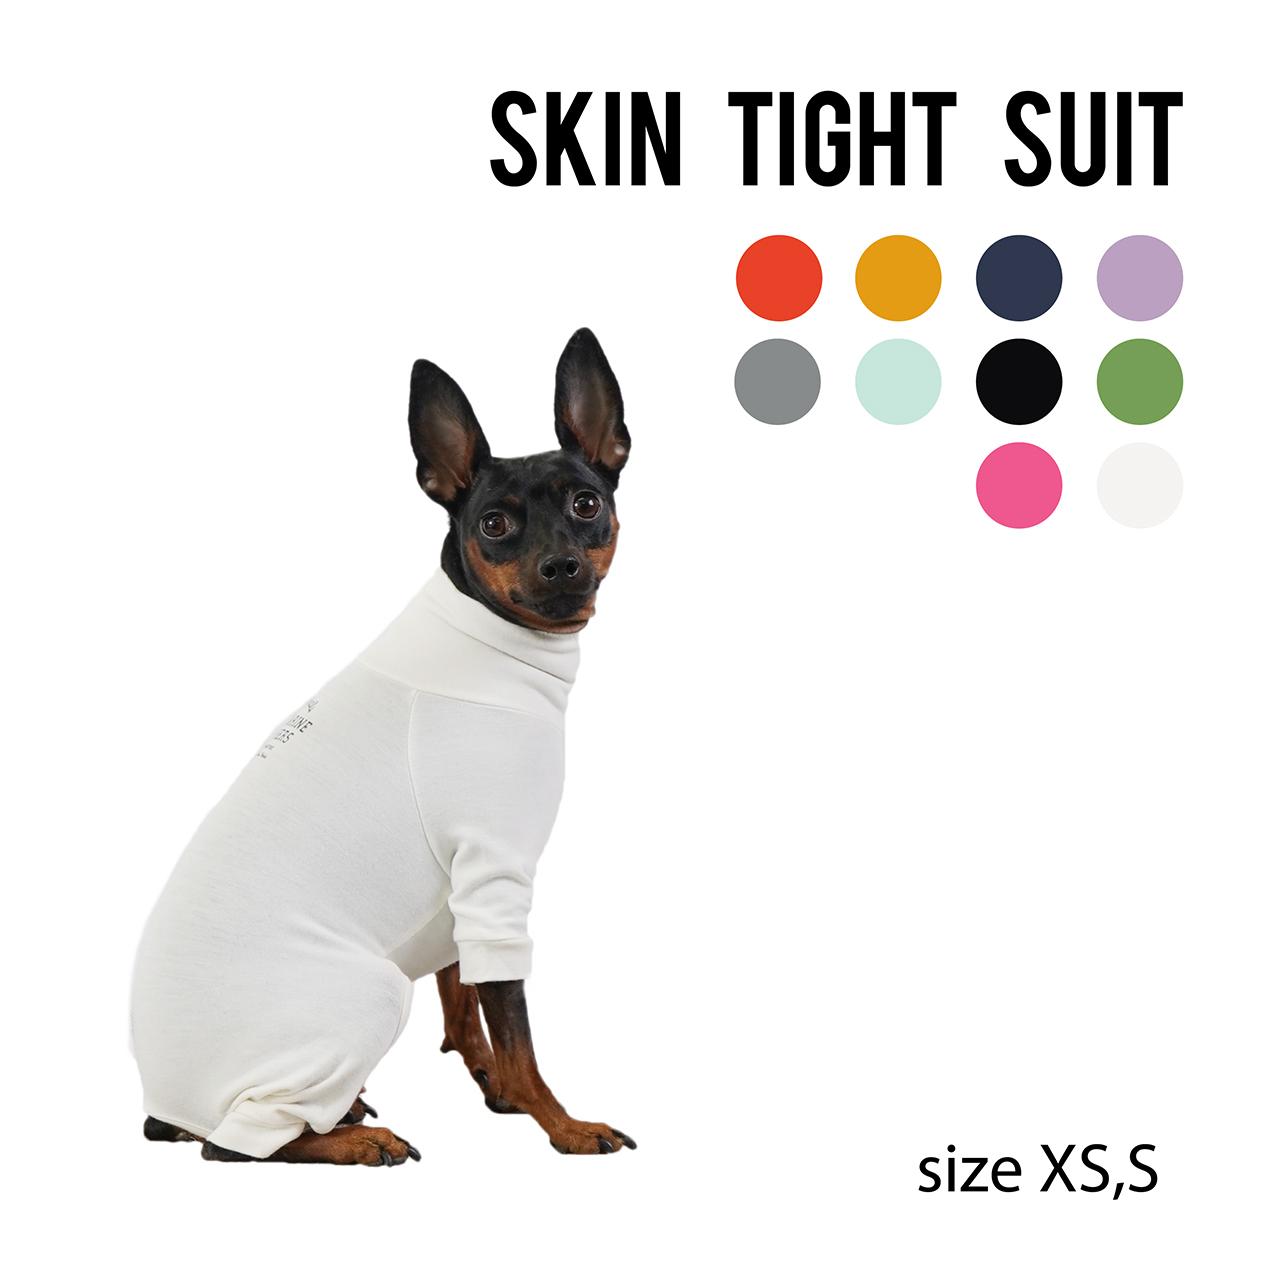 SKIN TIGHT SUITS(XS,S)スキンタイトスーツ